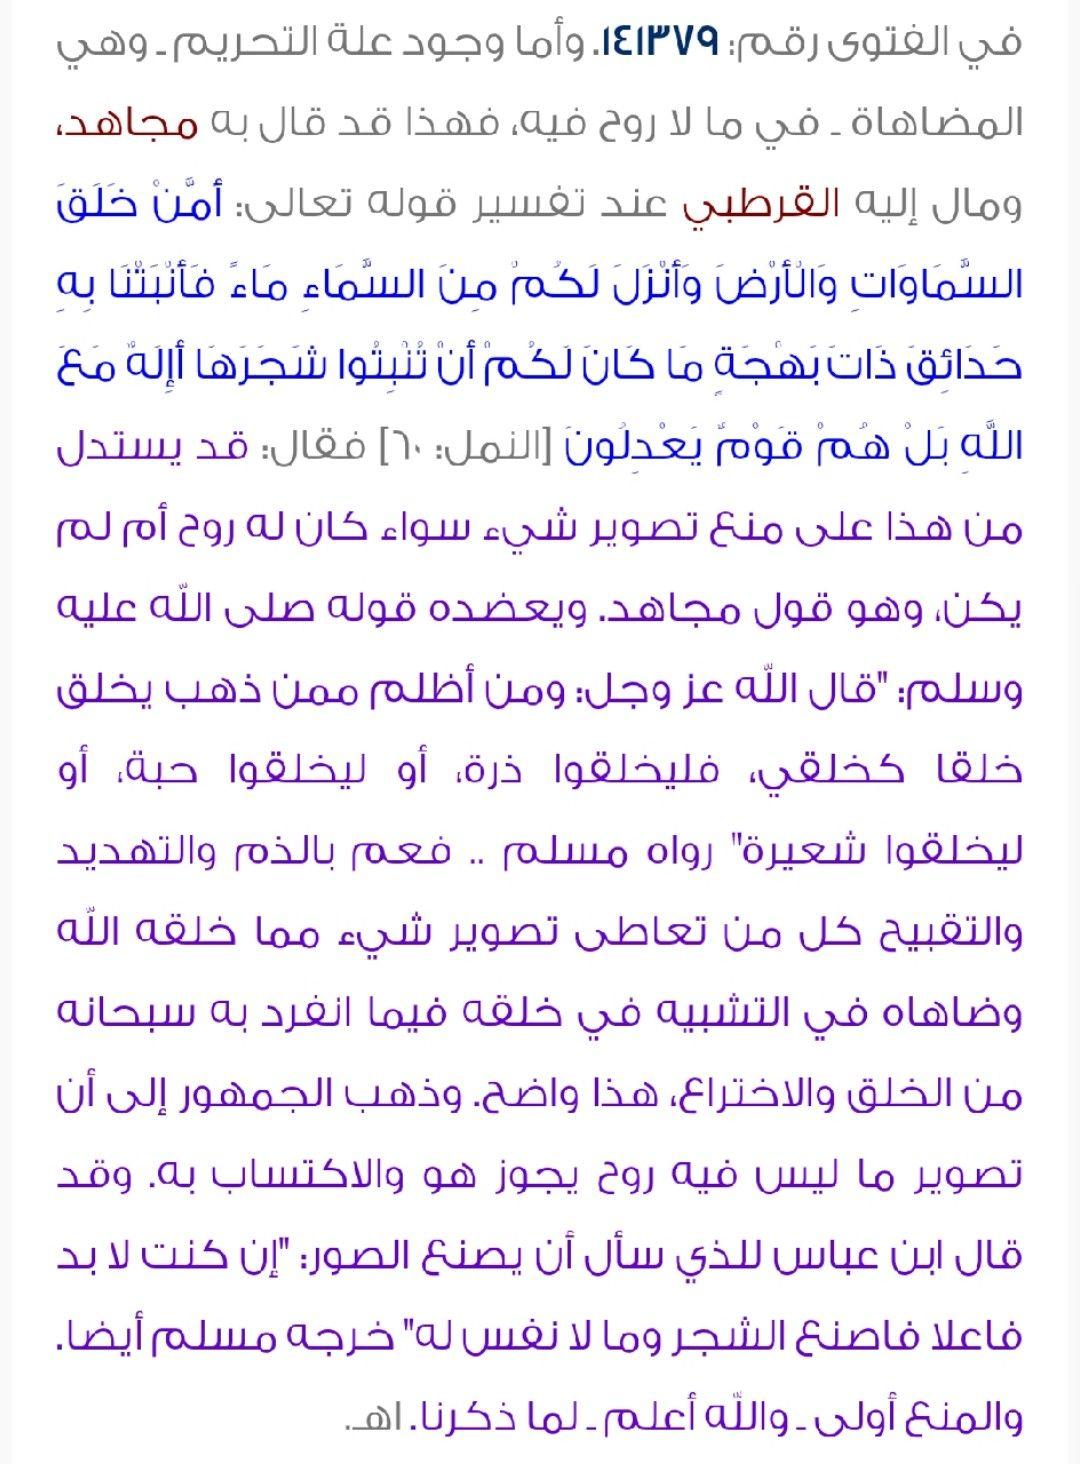 حكم رسم ما فيه روح إسلام ويب